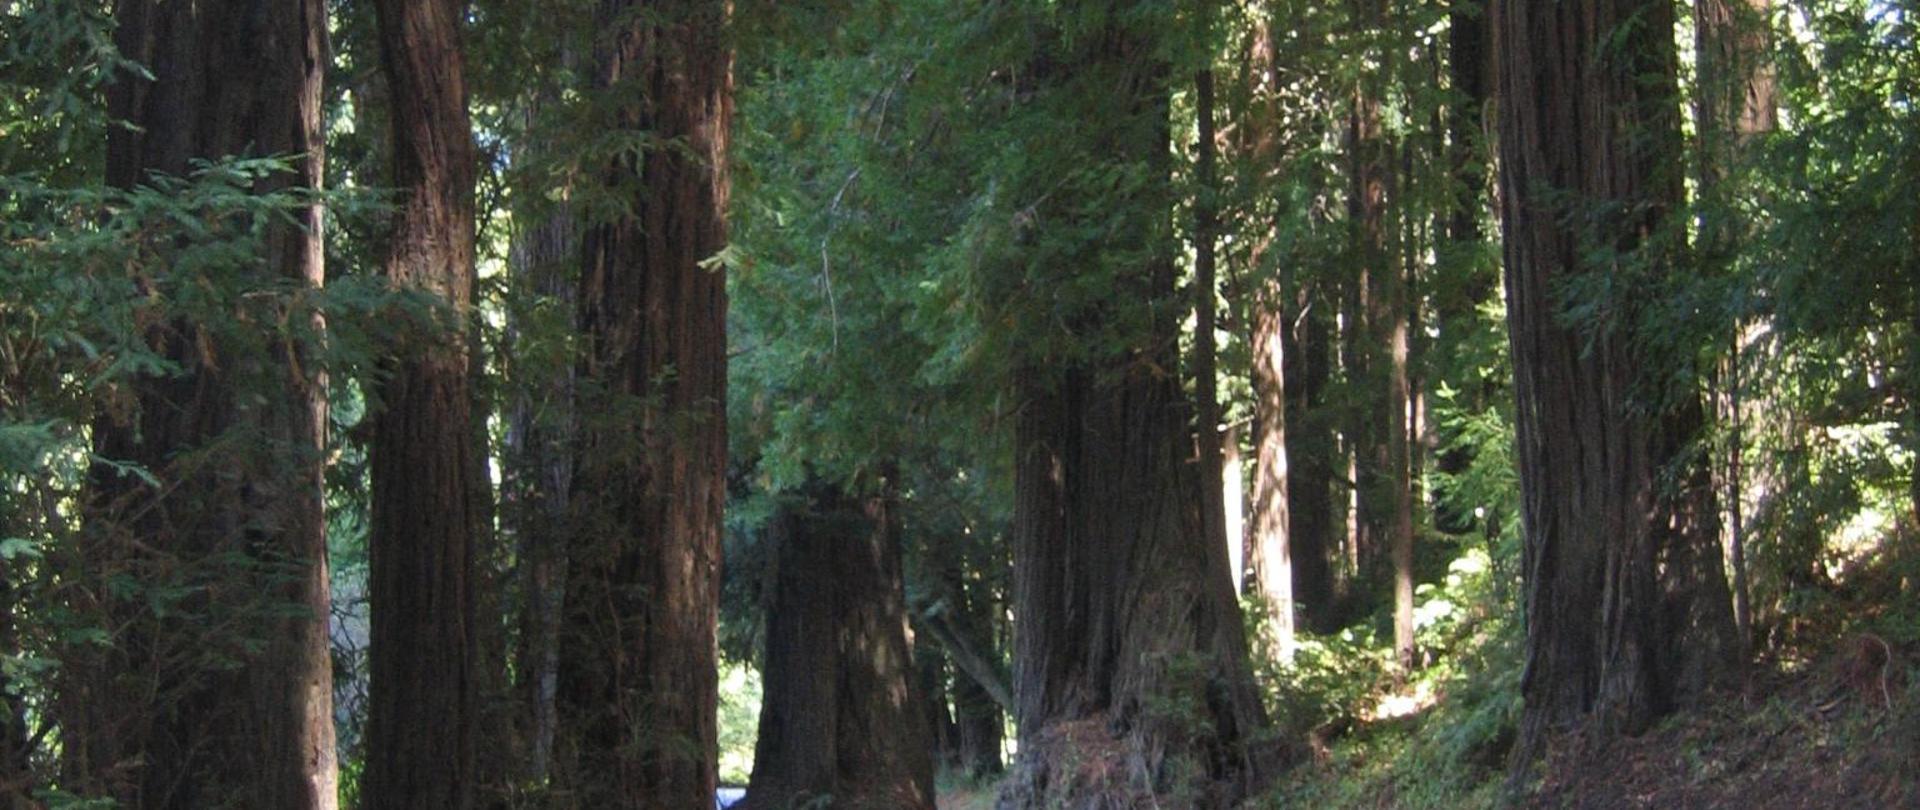 Butano redwoods '04 windy road.JPG